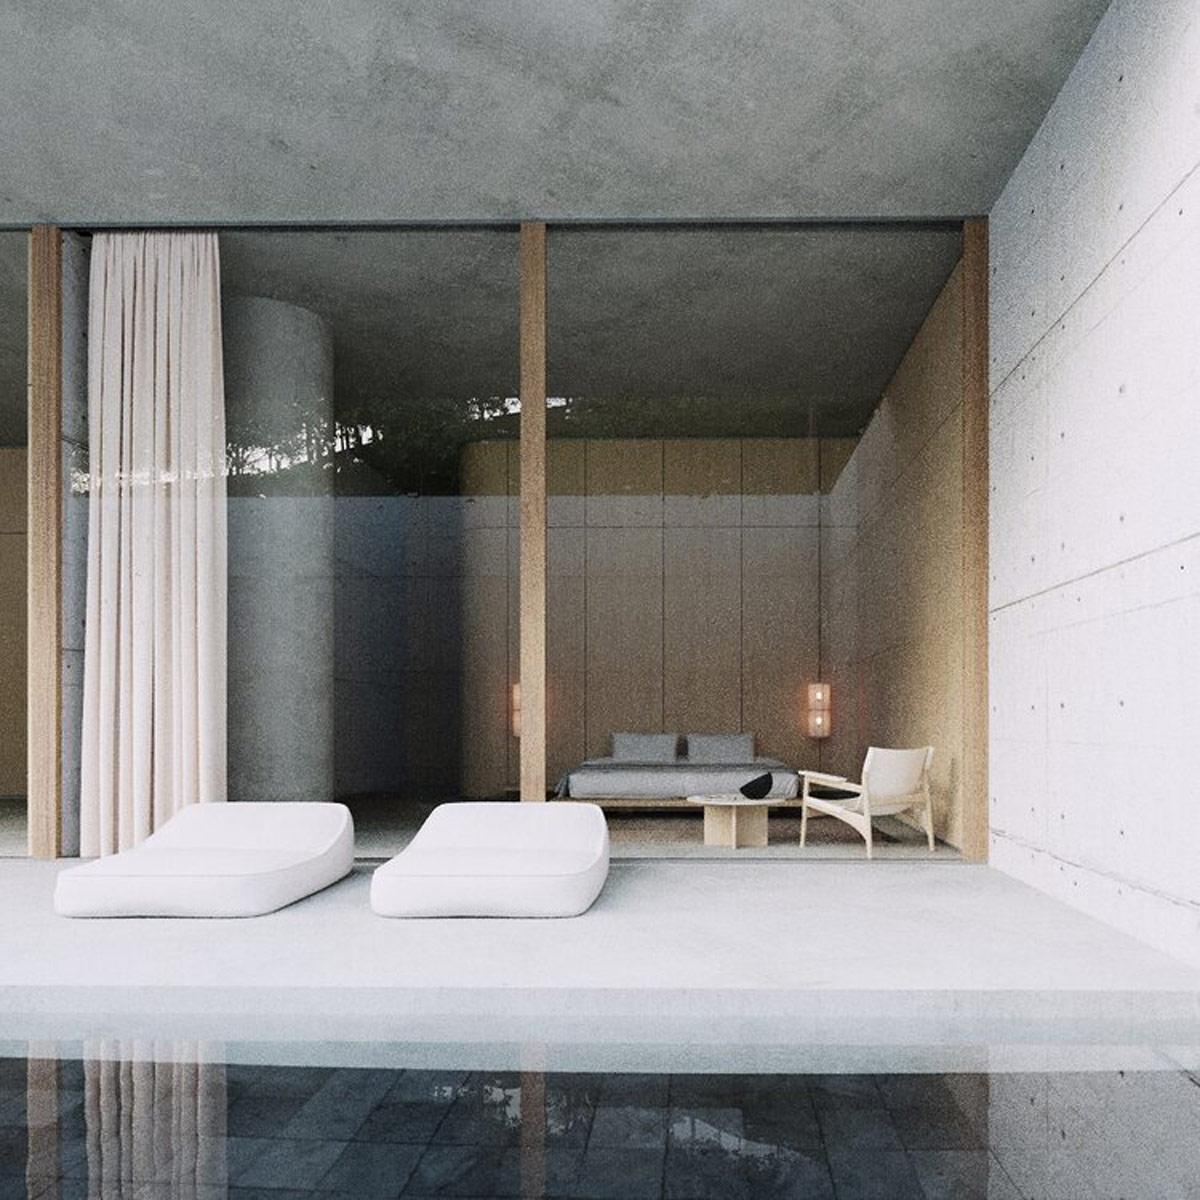 glass-wall-bedroom-1